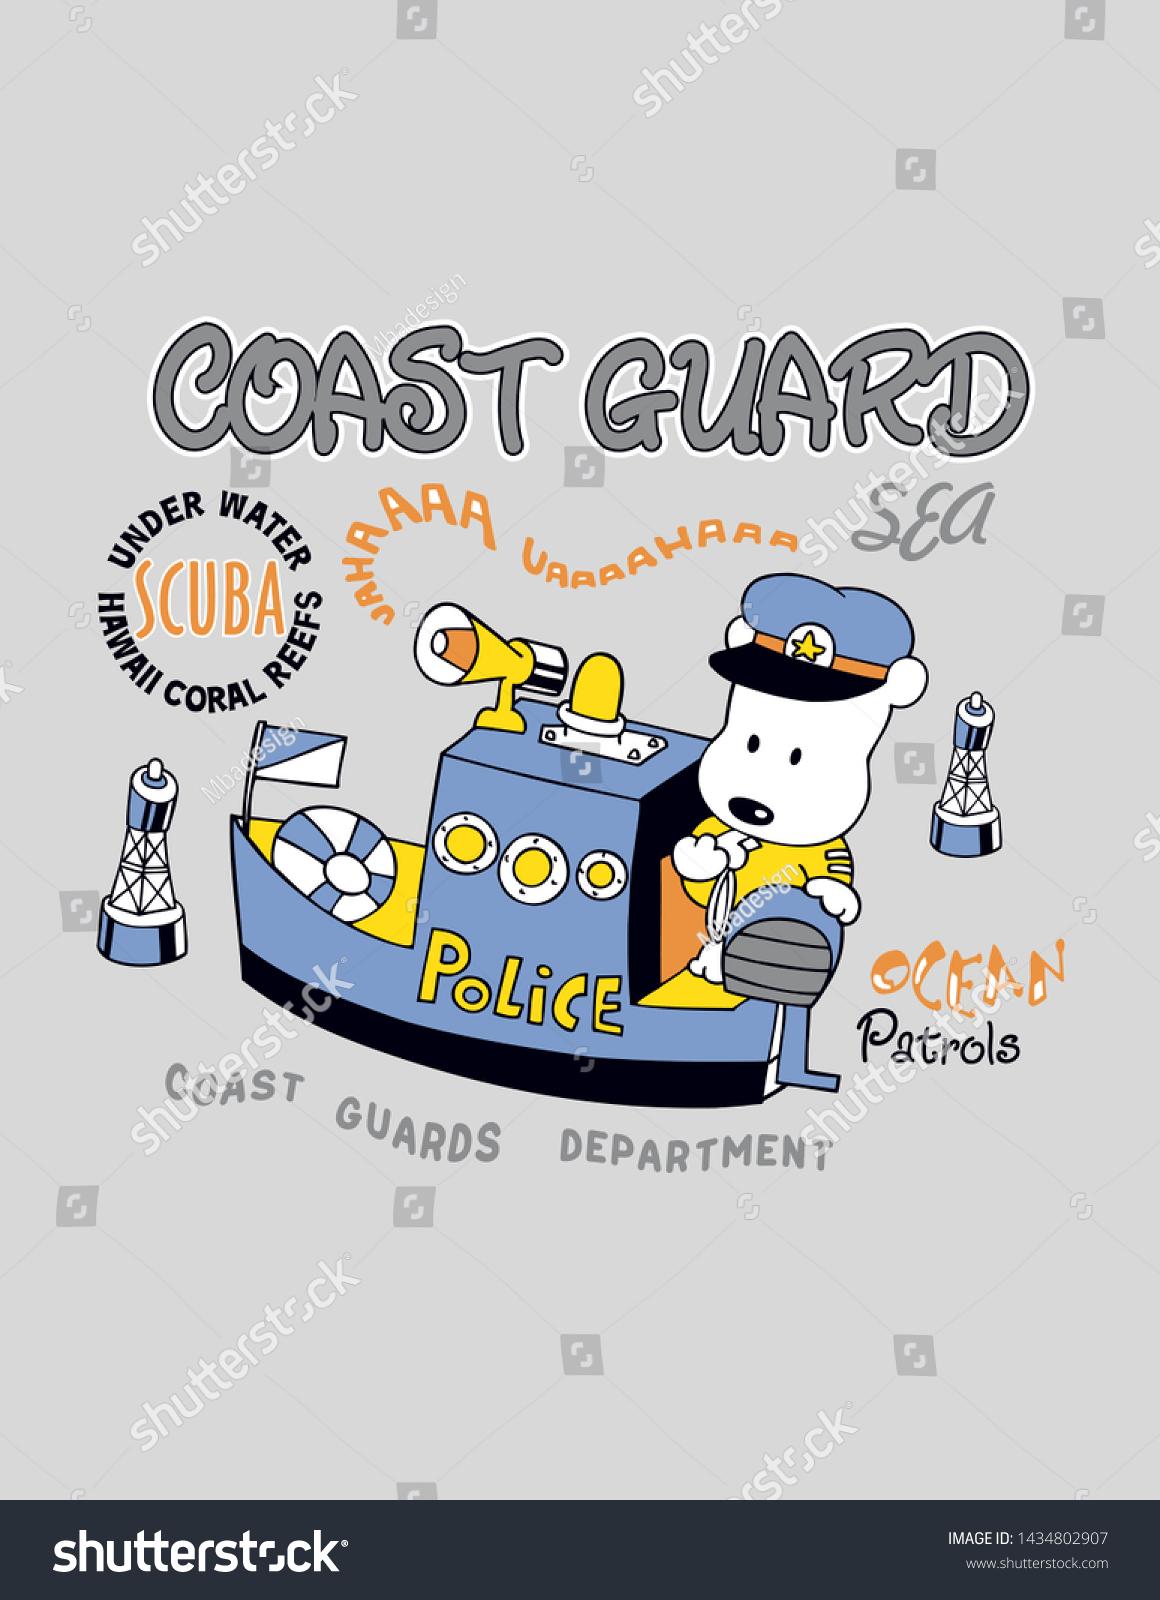 Coast Cartoon Dog Police Design Print Stock Vector Royalty Free